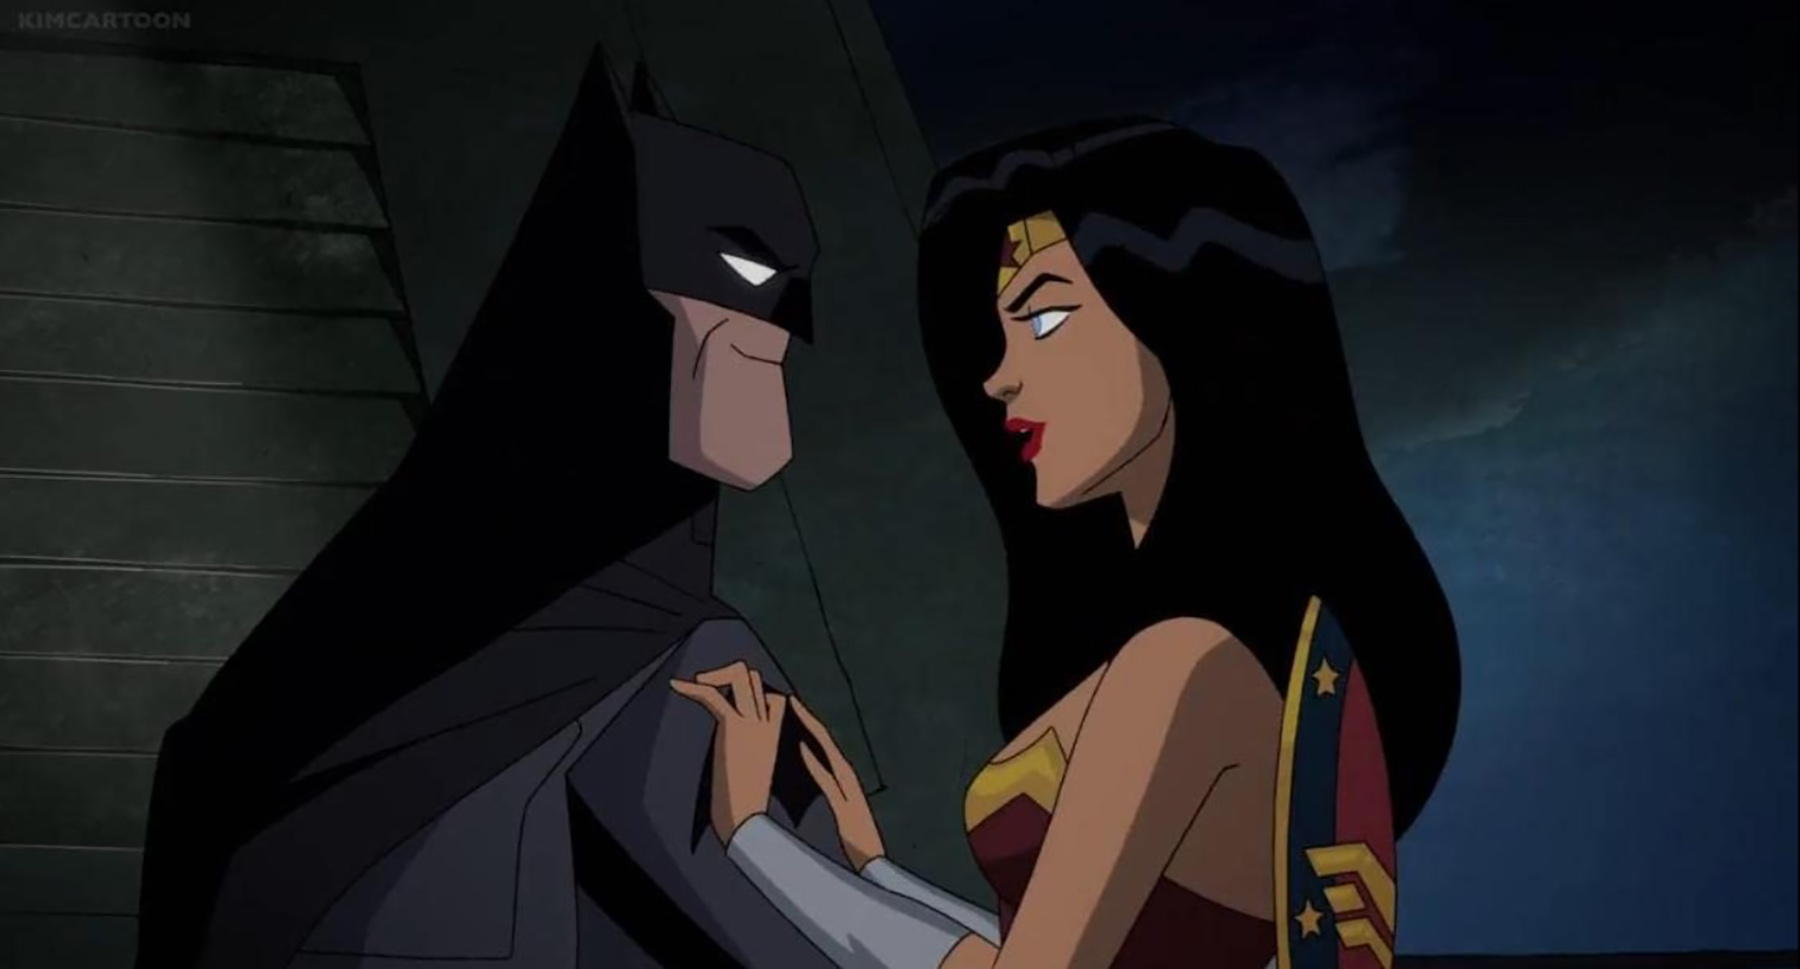 Betmen, Wonder Woman